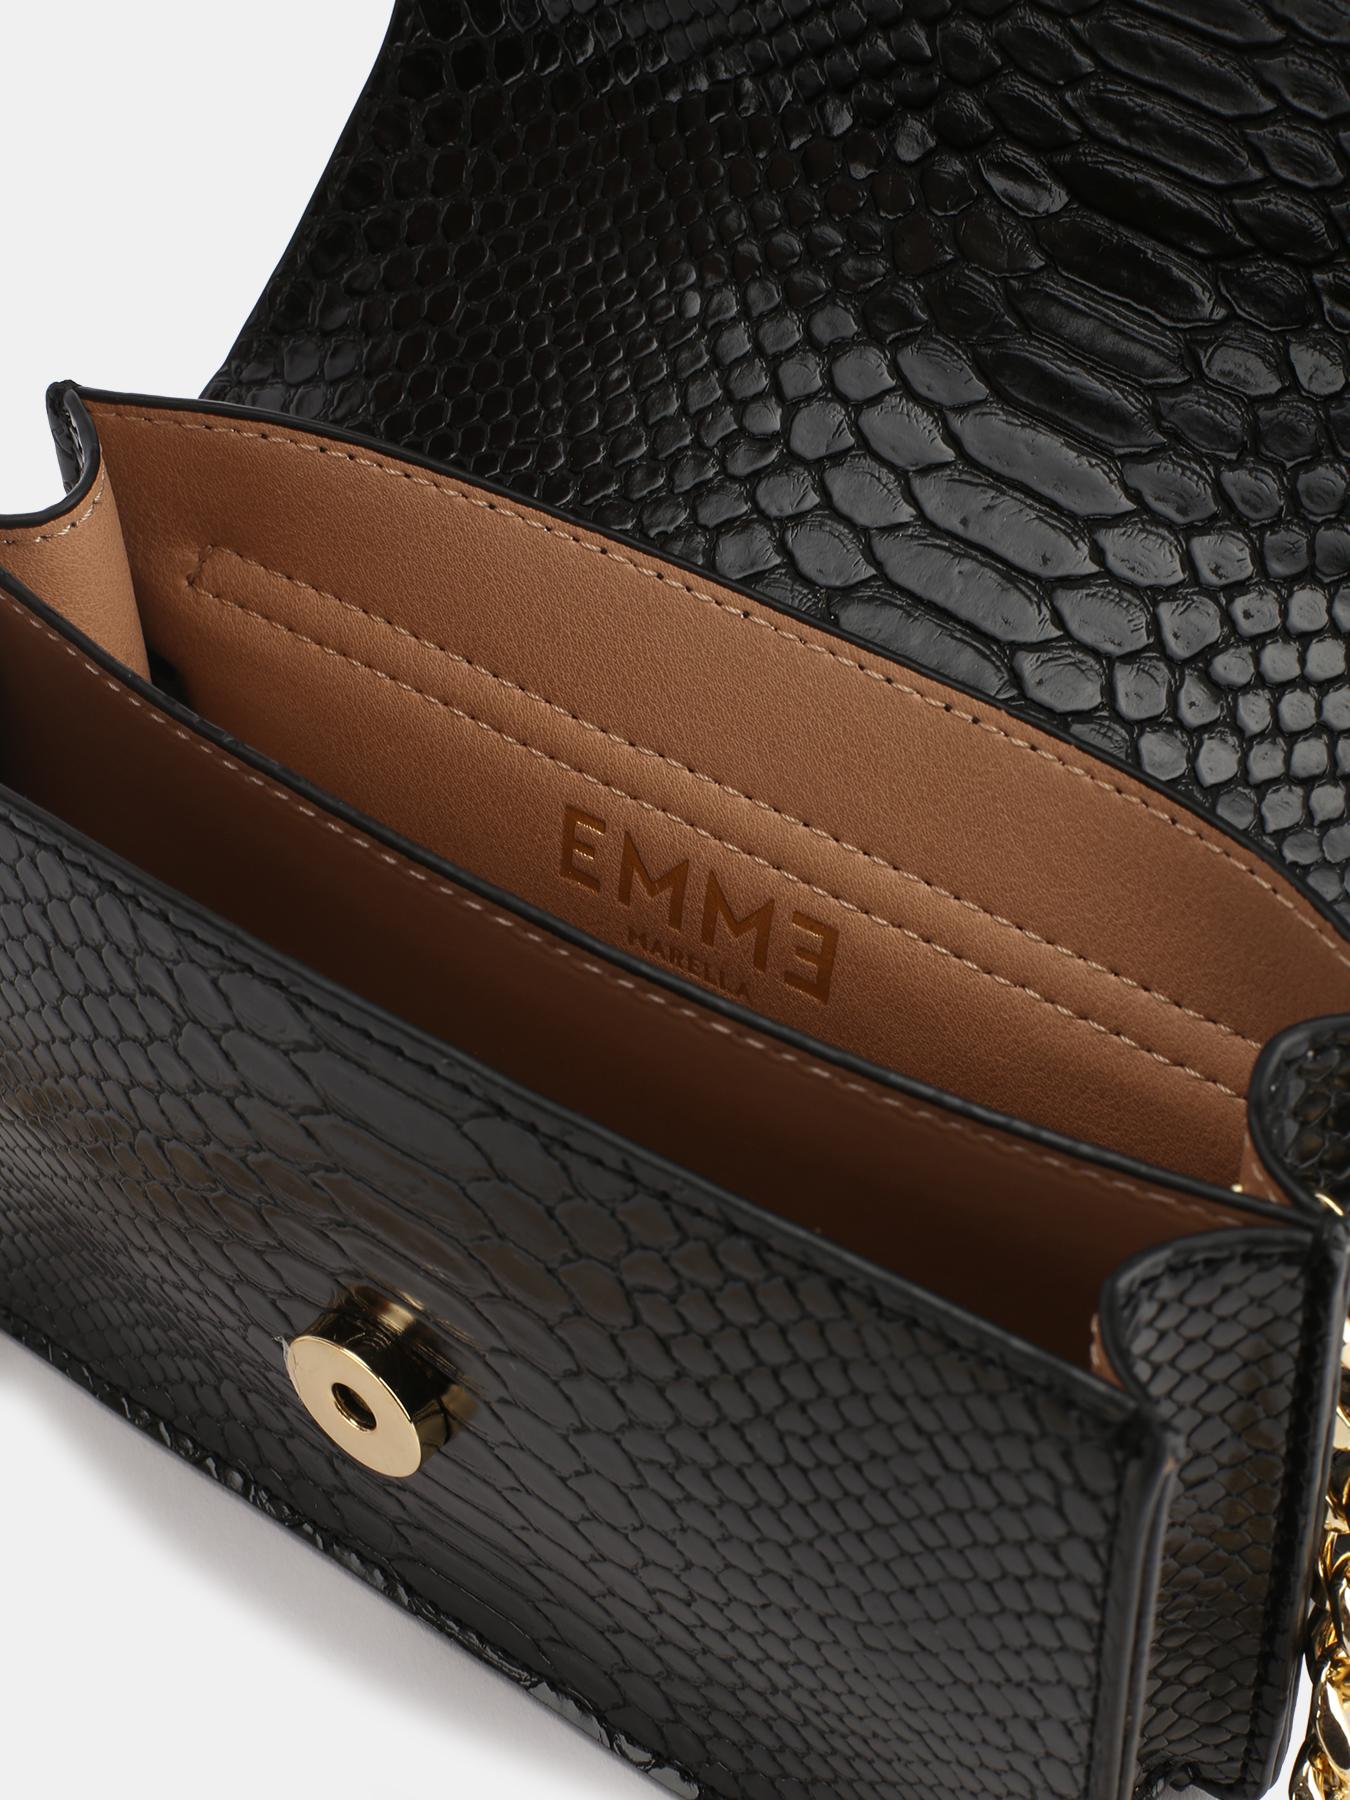 Emme Marella Женская сумка Nello 351058-185 Фото 3